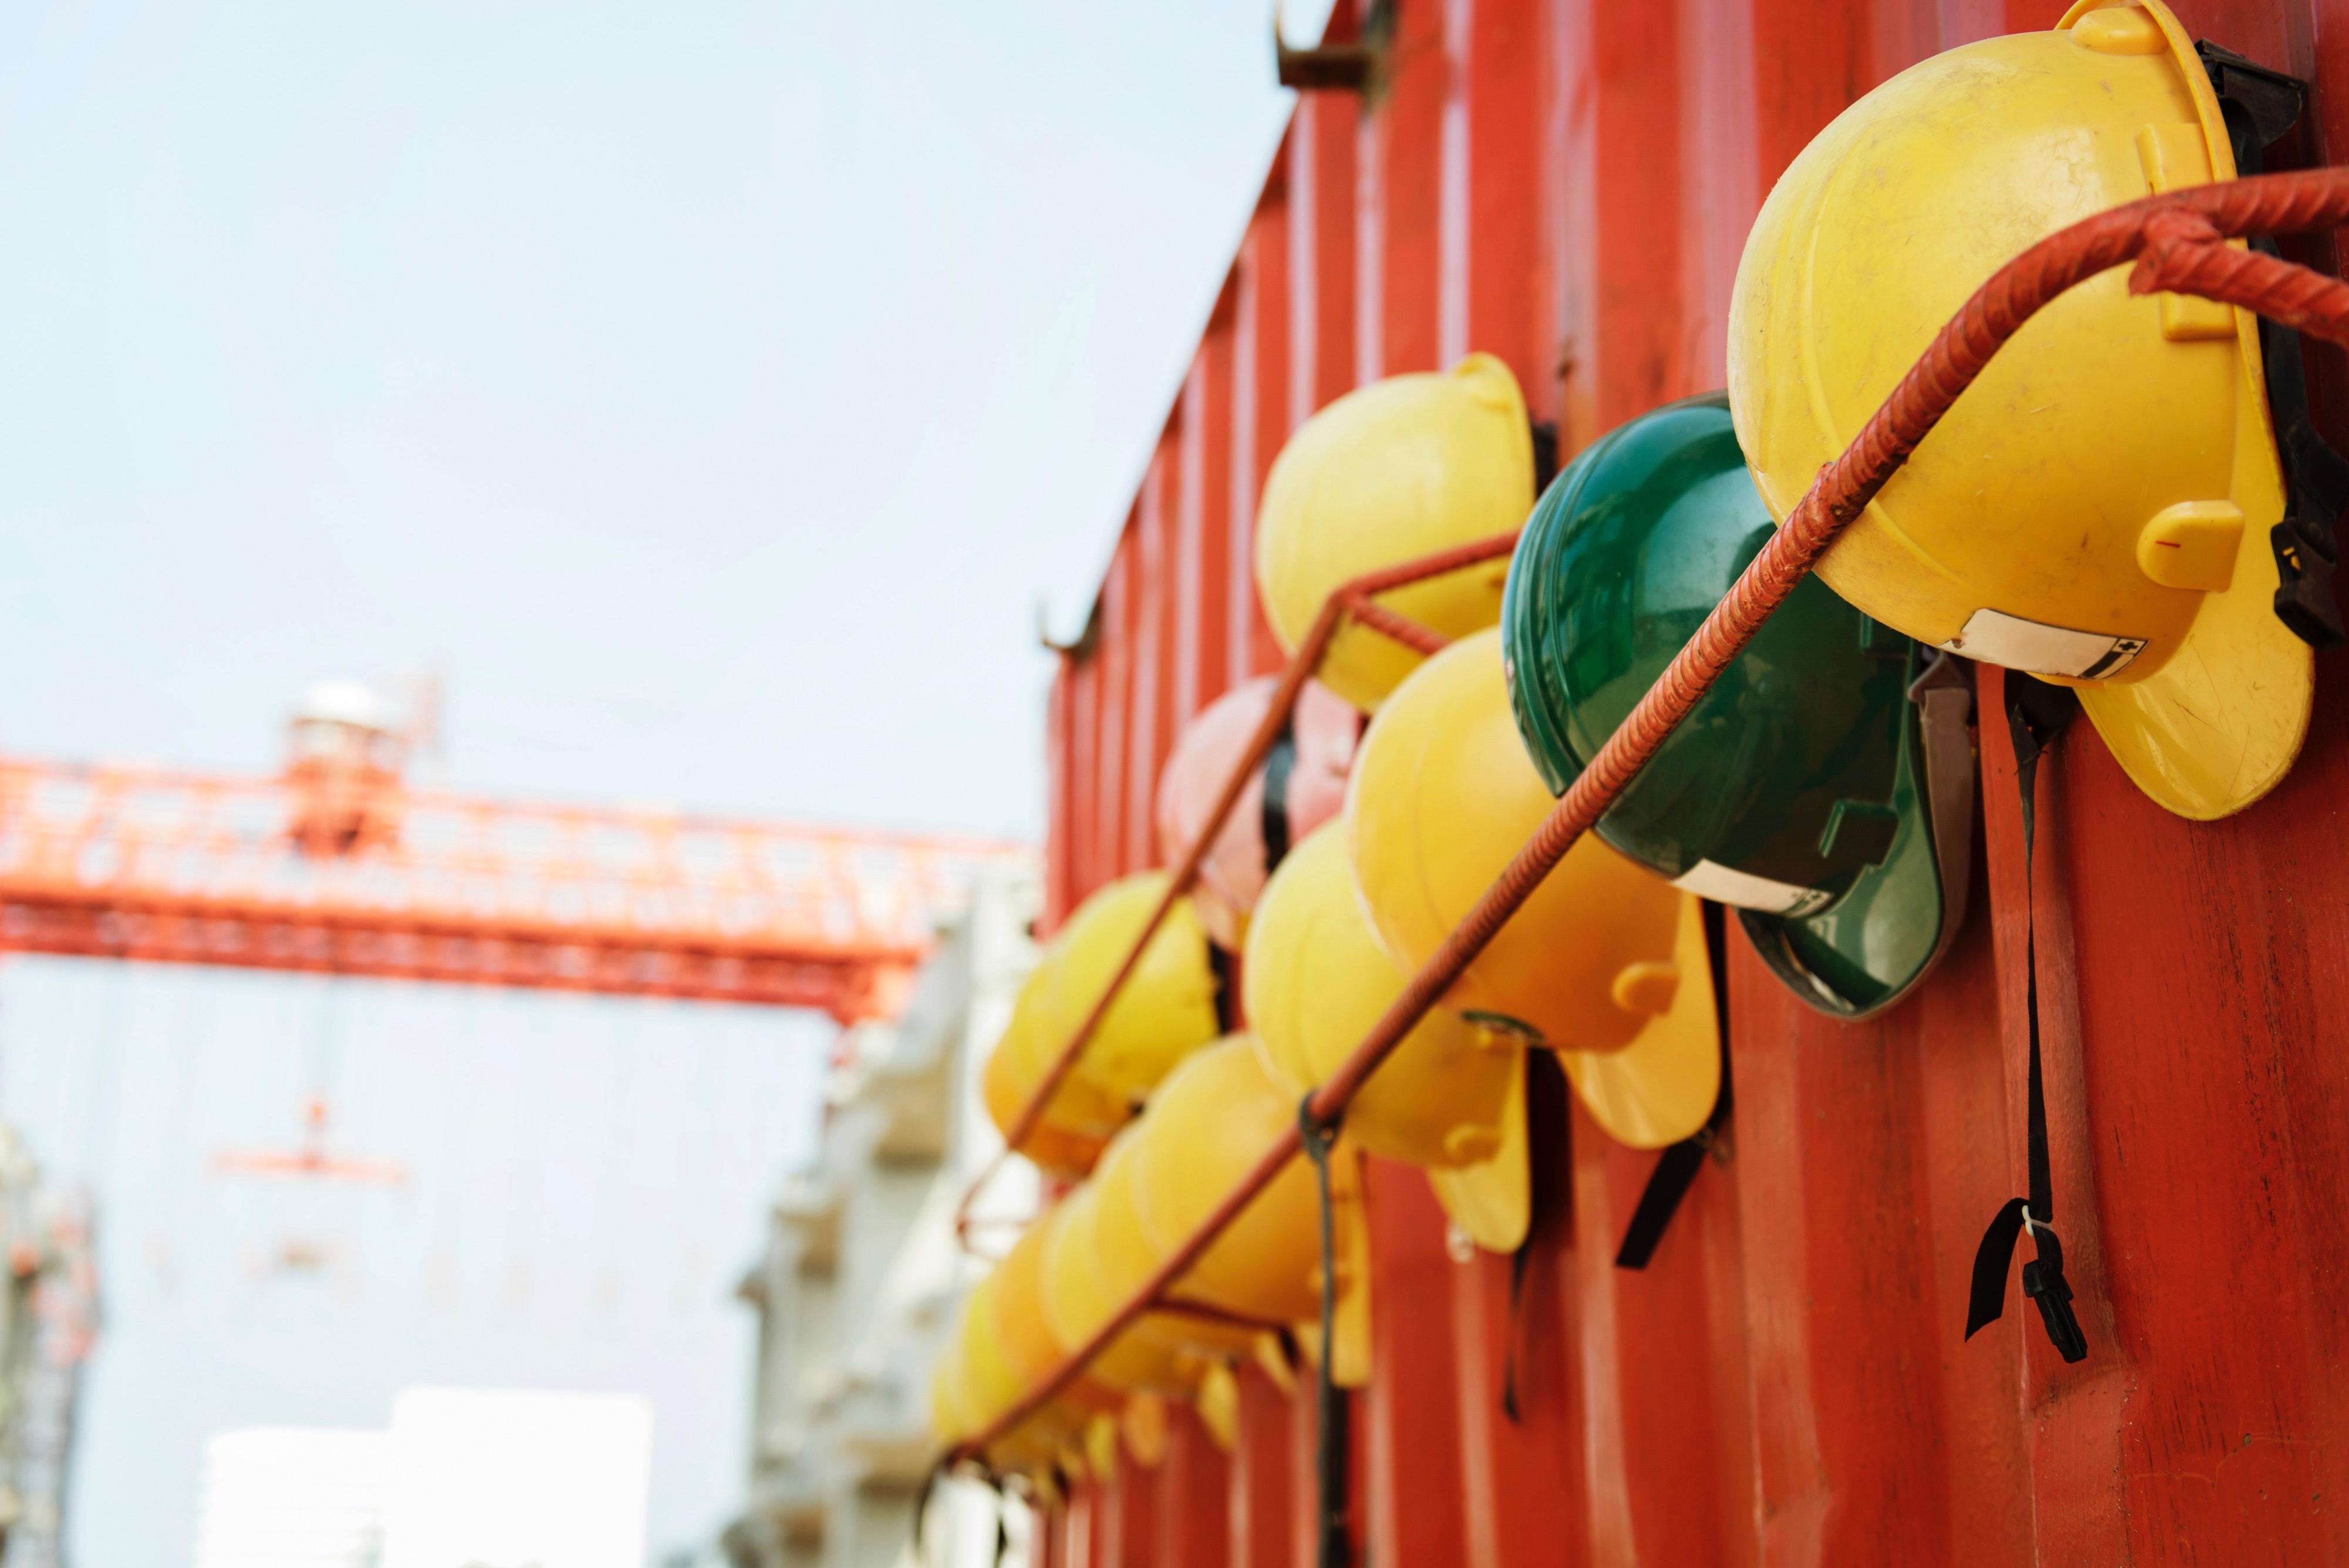 Construciton-Site-Helmets